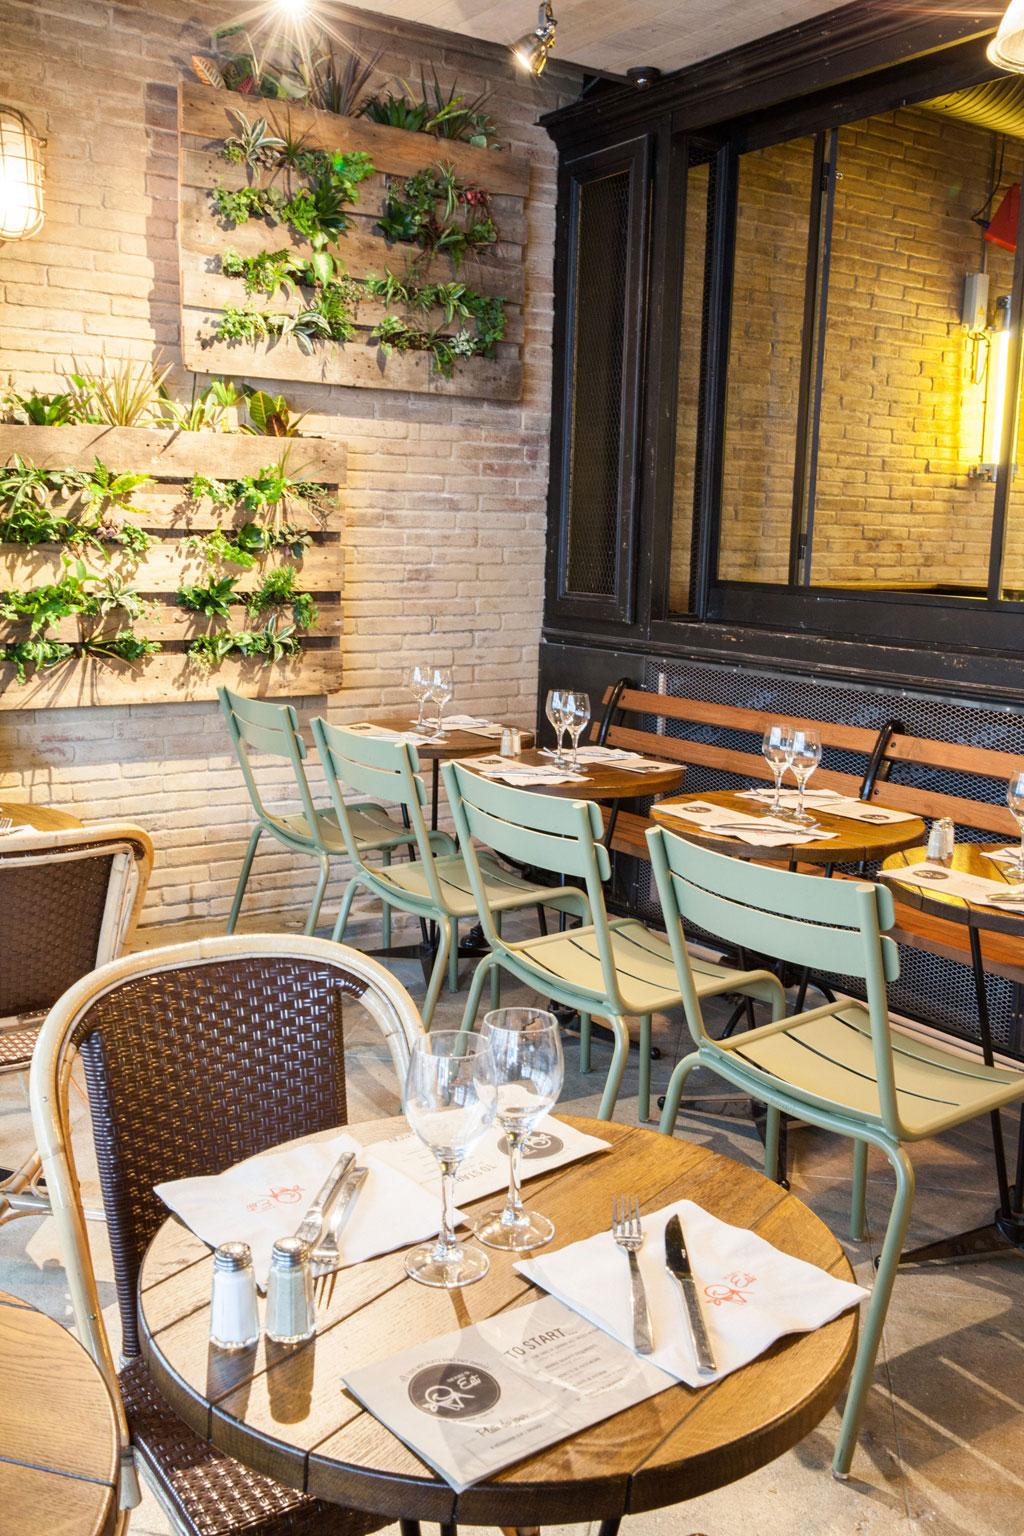 The Place To Restaurant Tipp Paris Trips4kids